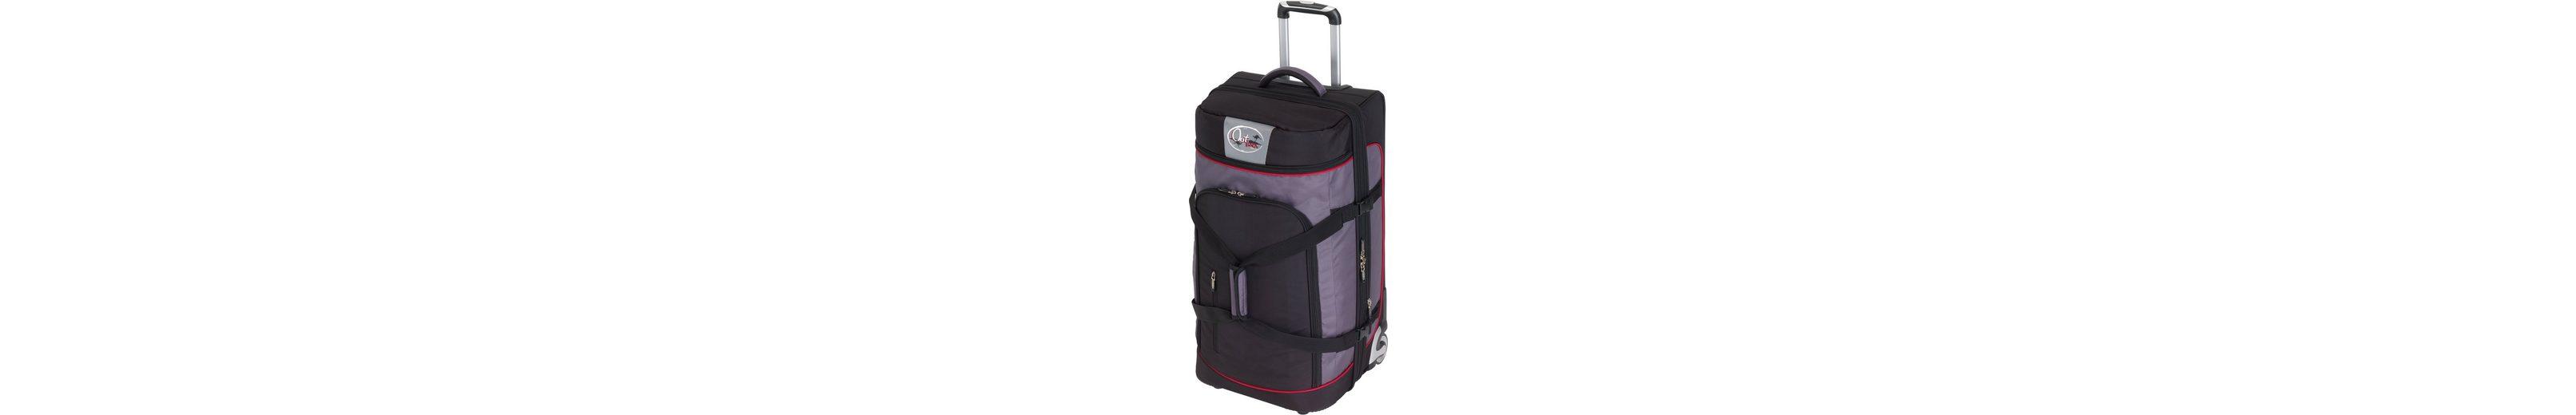 OutBAG Trolley Reisetasche mit 2 Rollen, »OutBAG SPORTS L, schwarz/rot«